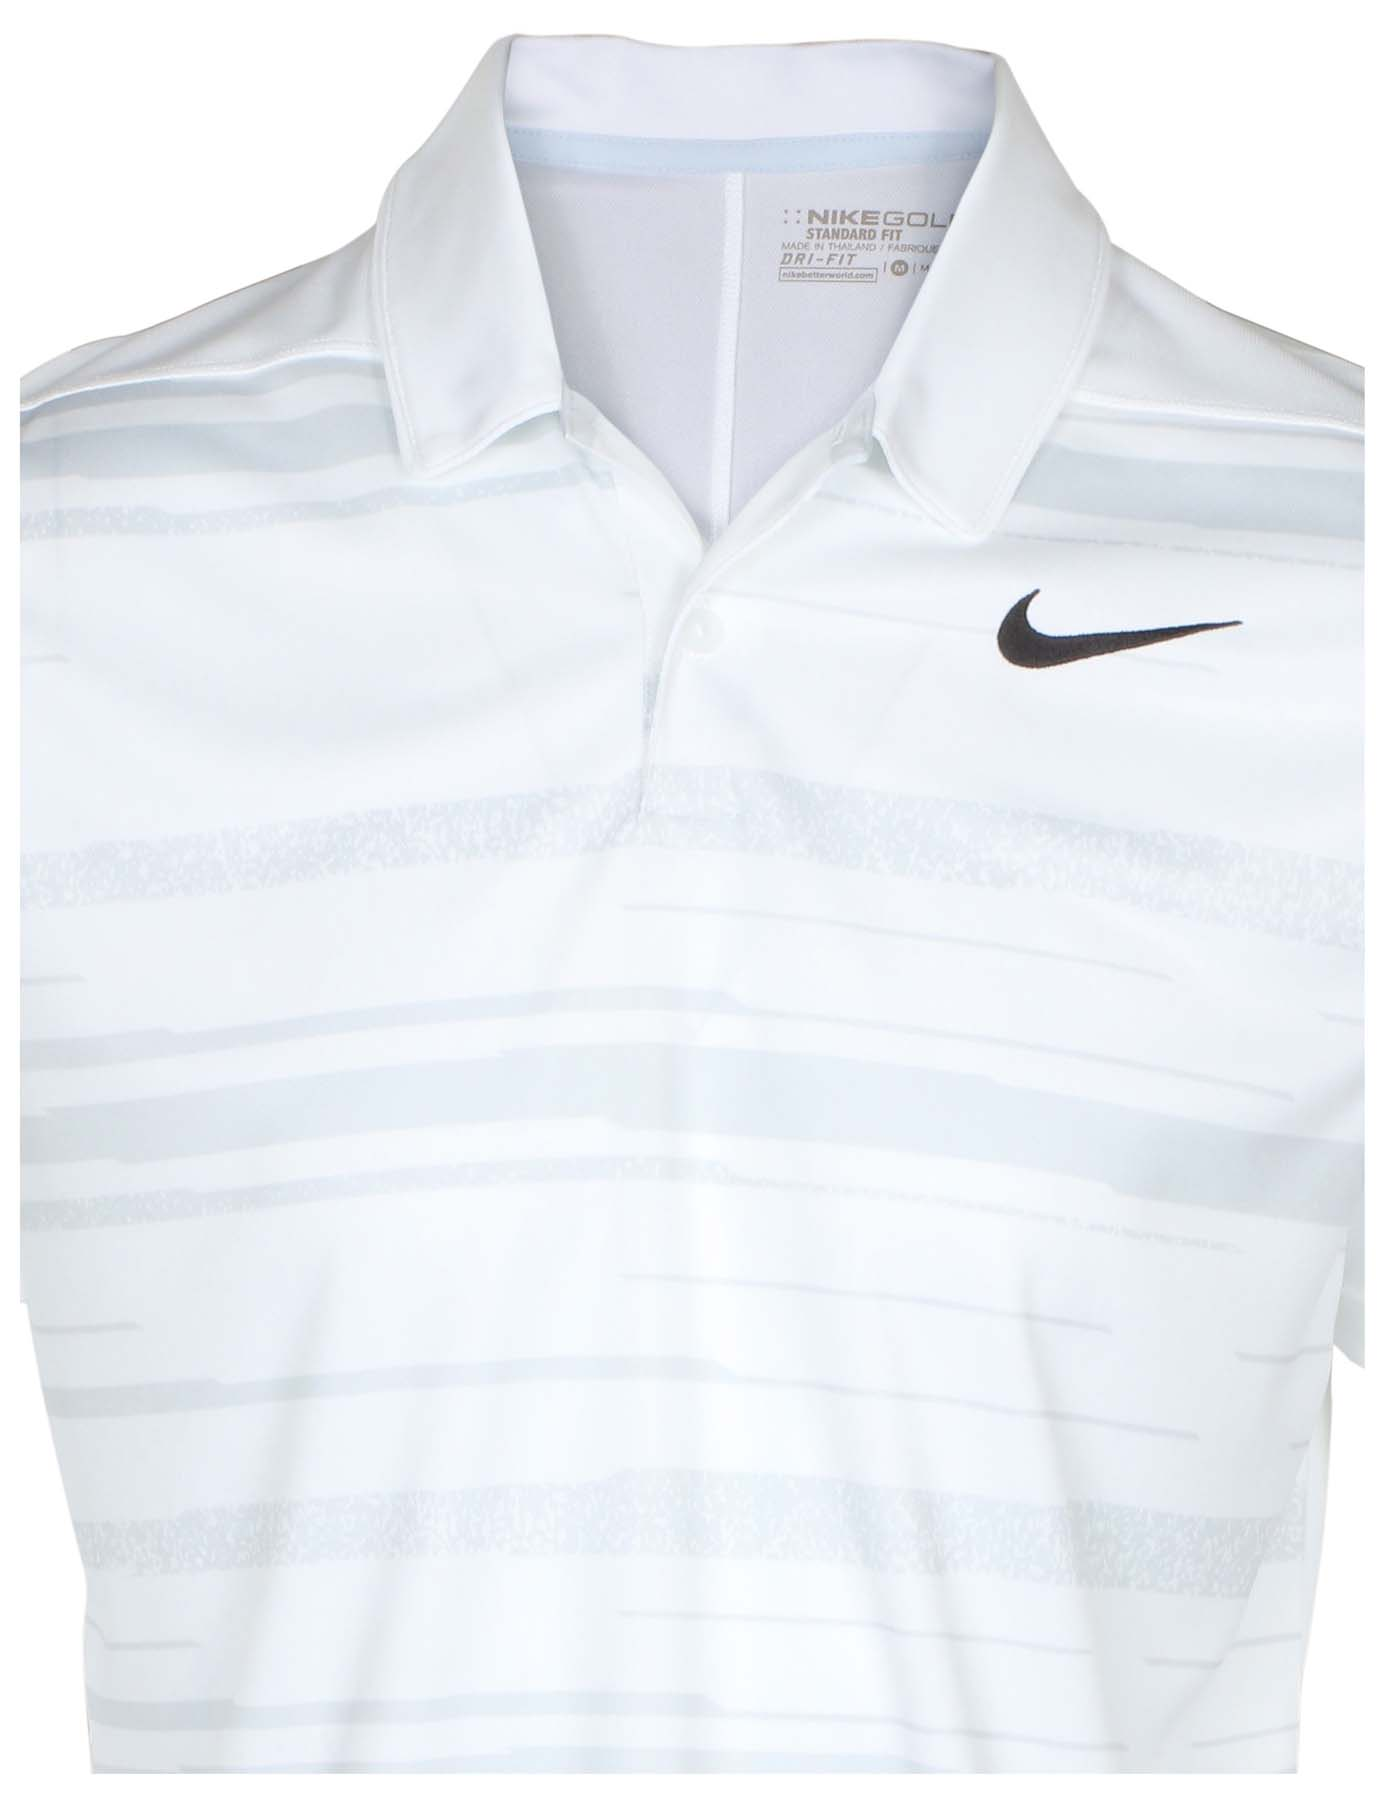 Nike Men's Dri-Fit Essential Standard Fit Golf Polo Shirt